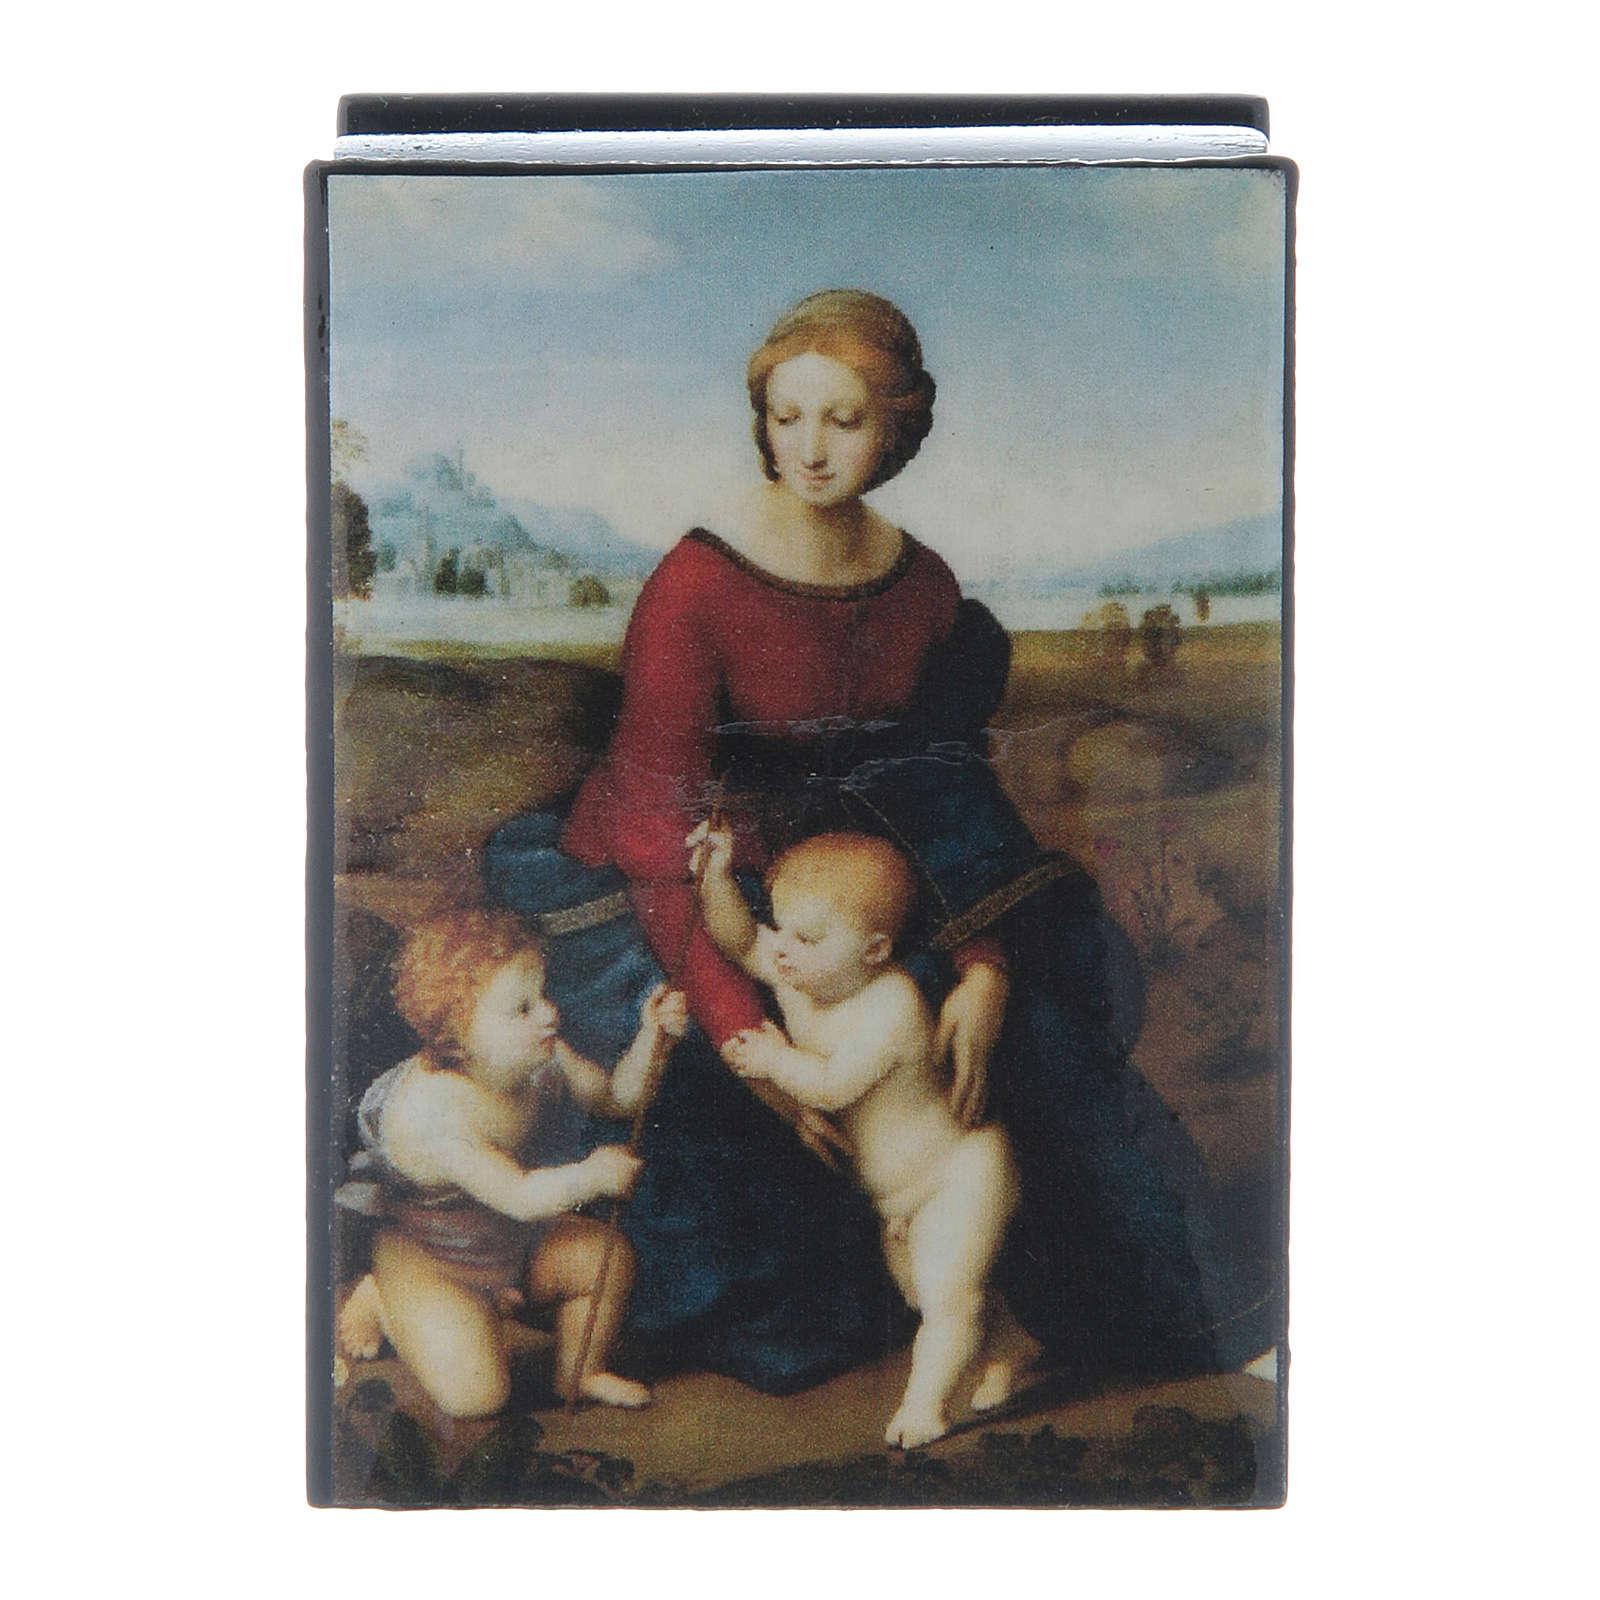 Russian papier-mâché and lacquer box Madonna del Prato 7x5 cm 4